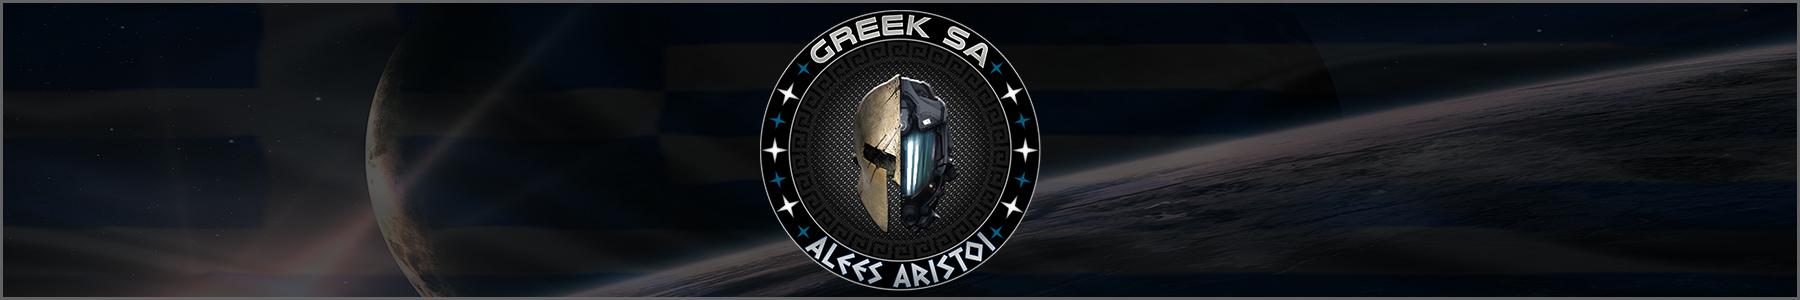 GreekSA